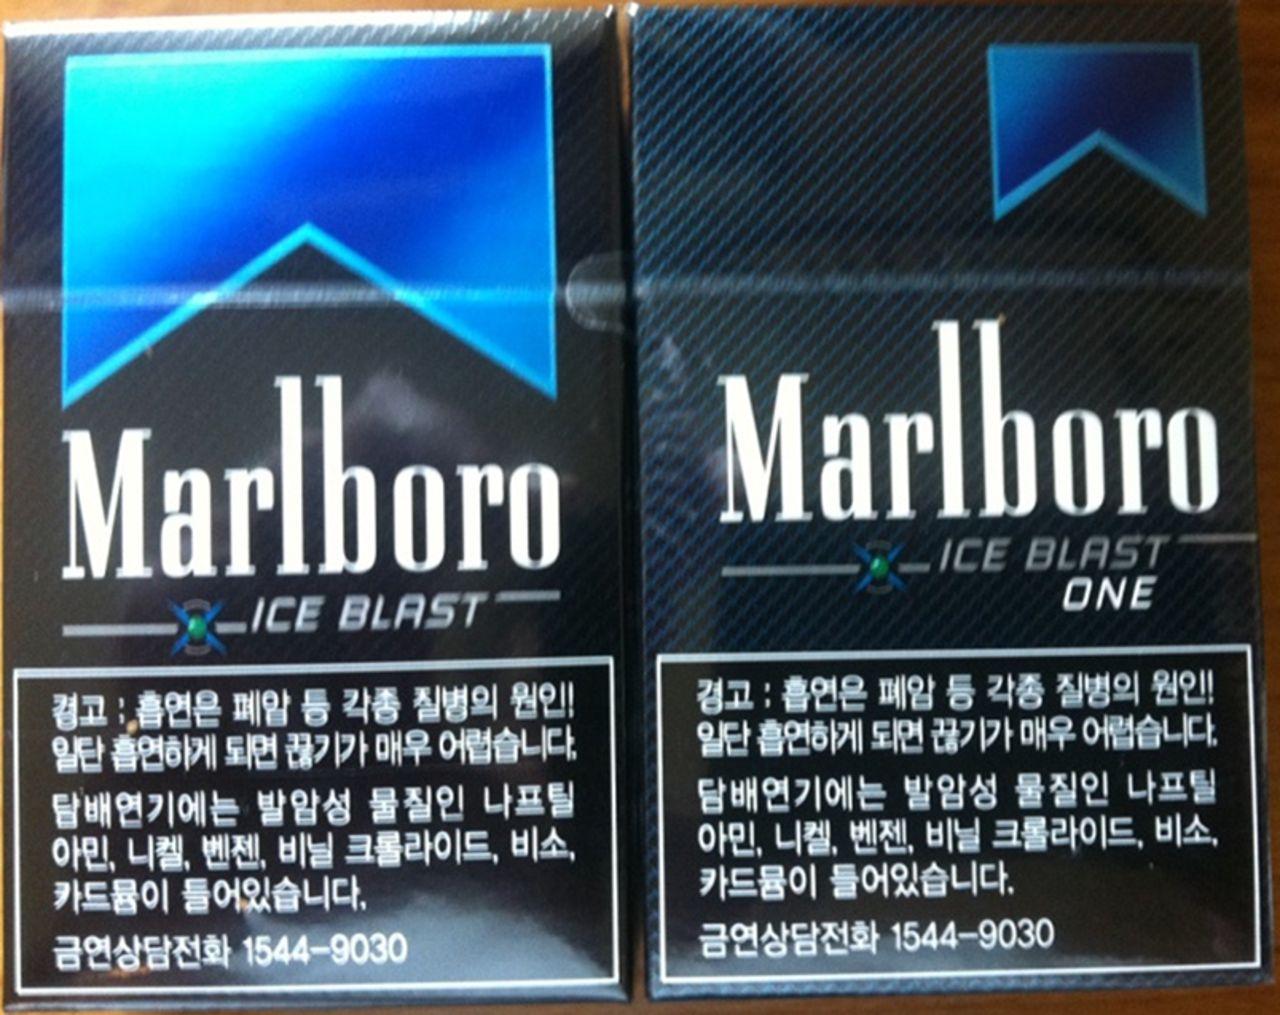 Cigarettes similar to Marlboro ice blast